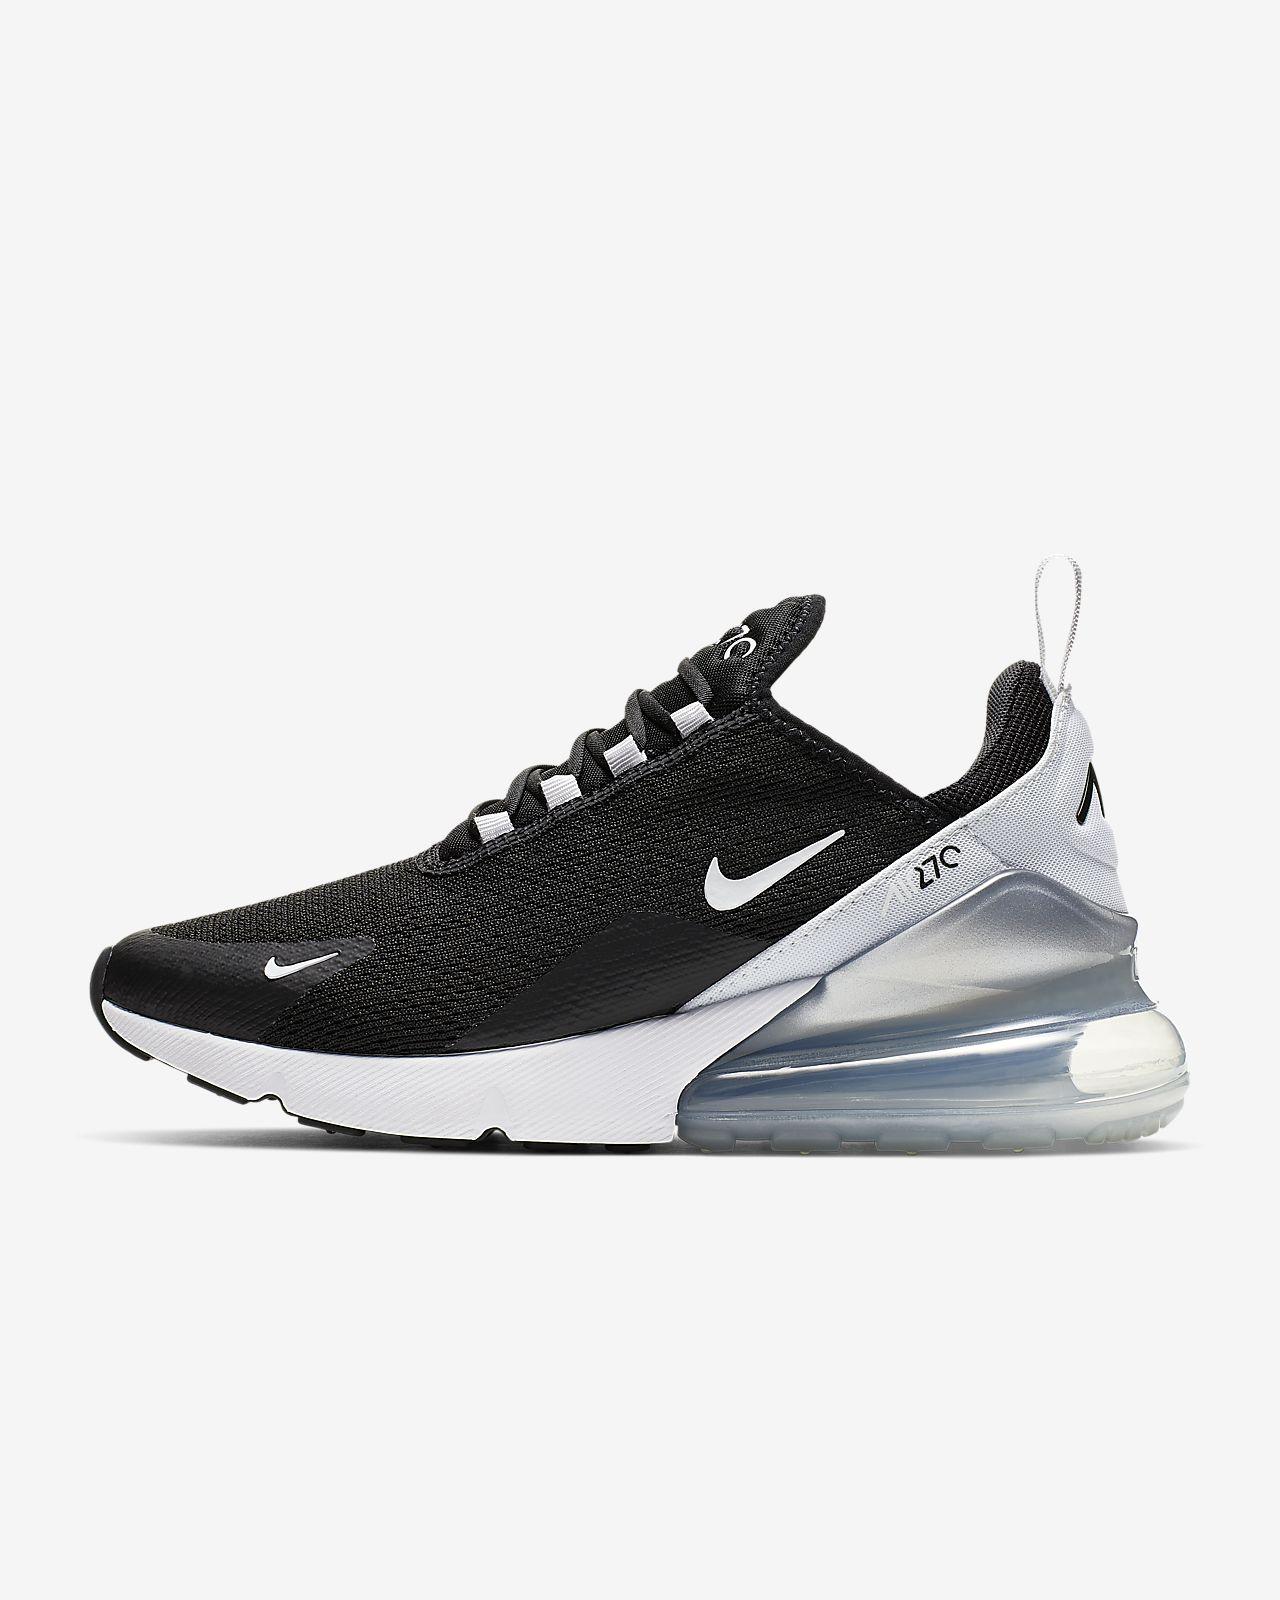 957221fb2f Scarpa Nike Air Max 270 - Donna. Nike.com CH